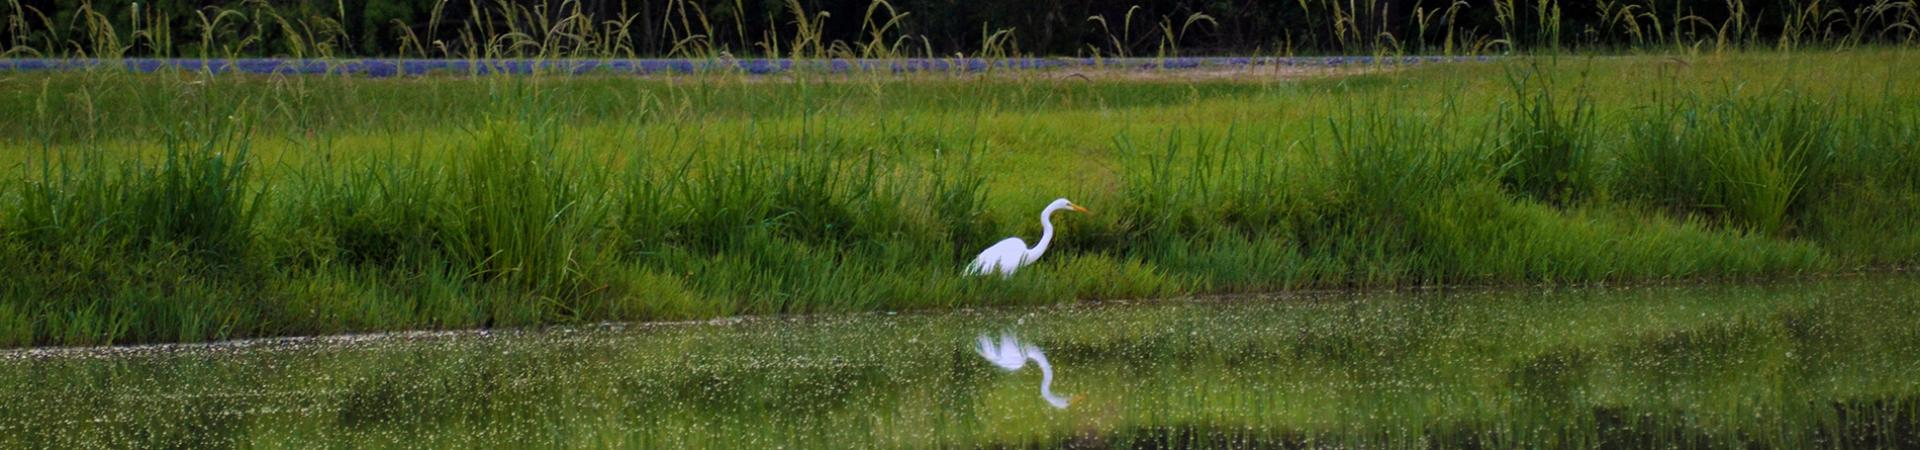 Bowens Mill Pond with Bird